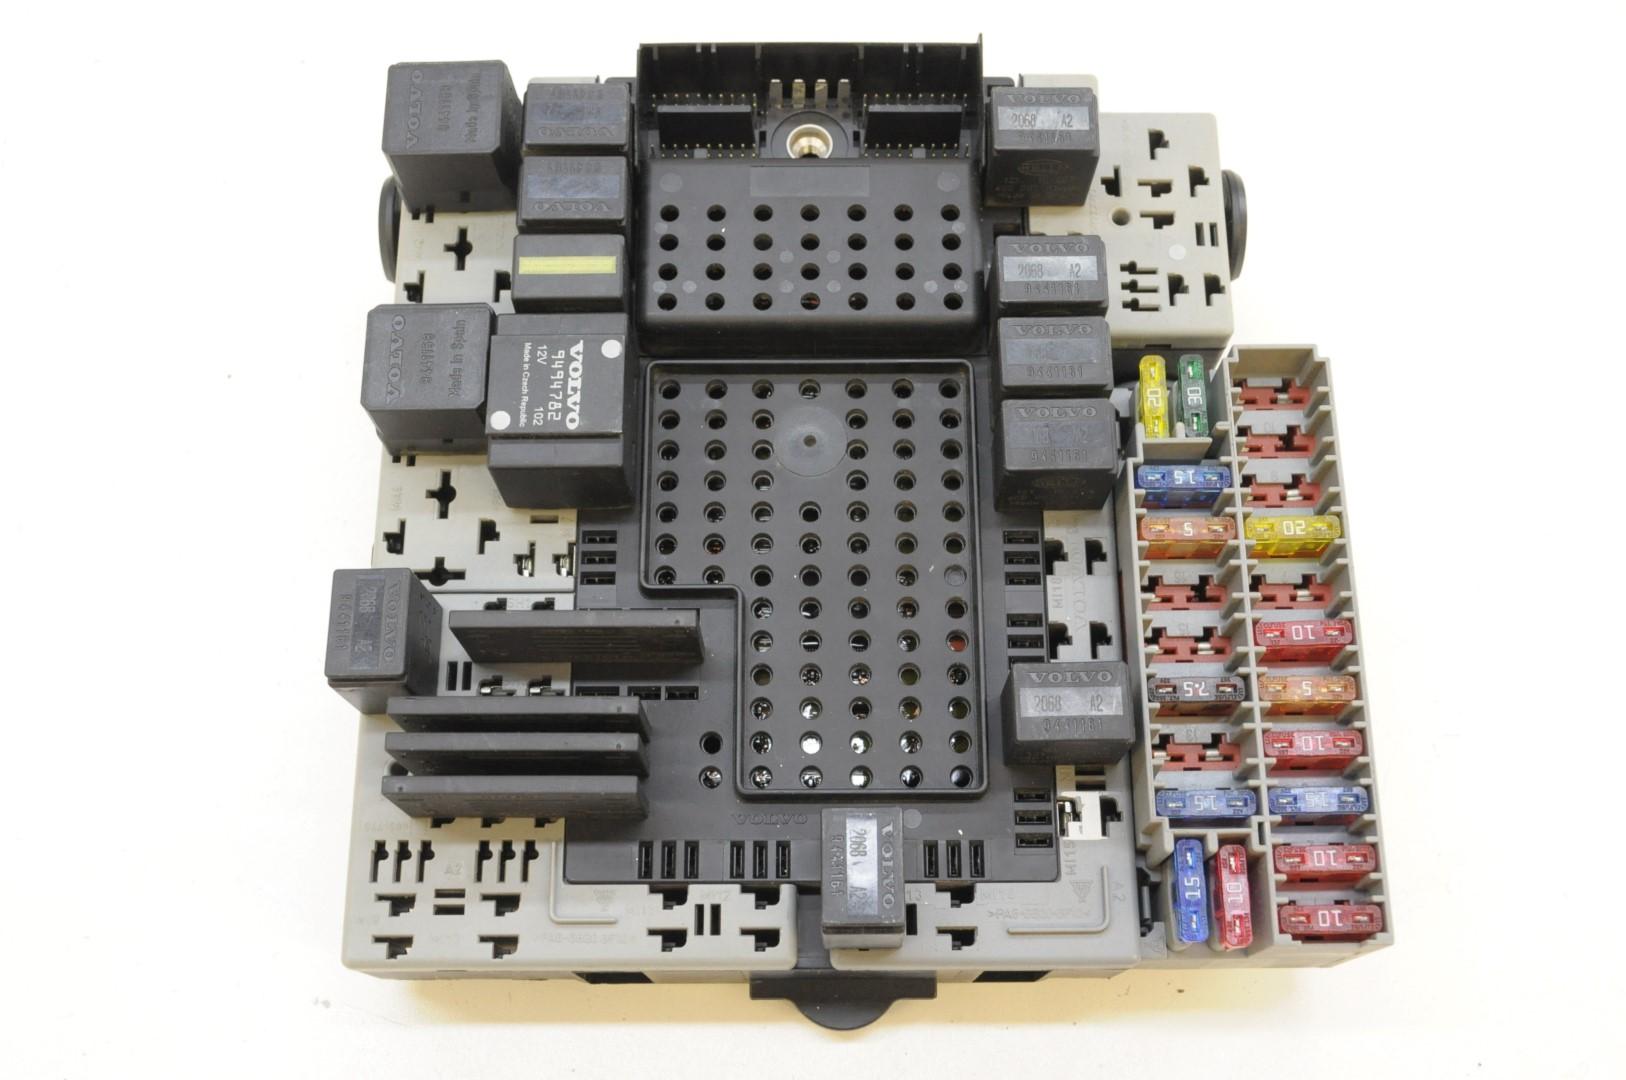 fuse box volvo v 70 volvo v70 2 4 d5 2002 rhd relay fuse box electric board module  volvo v70 2 4 d5 2002 rhd relay fuse